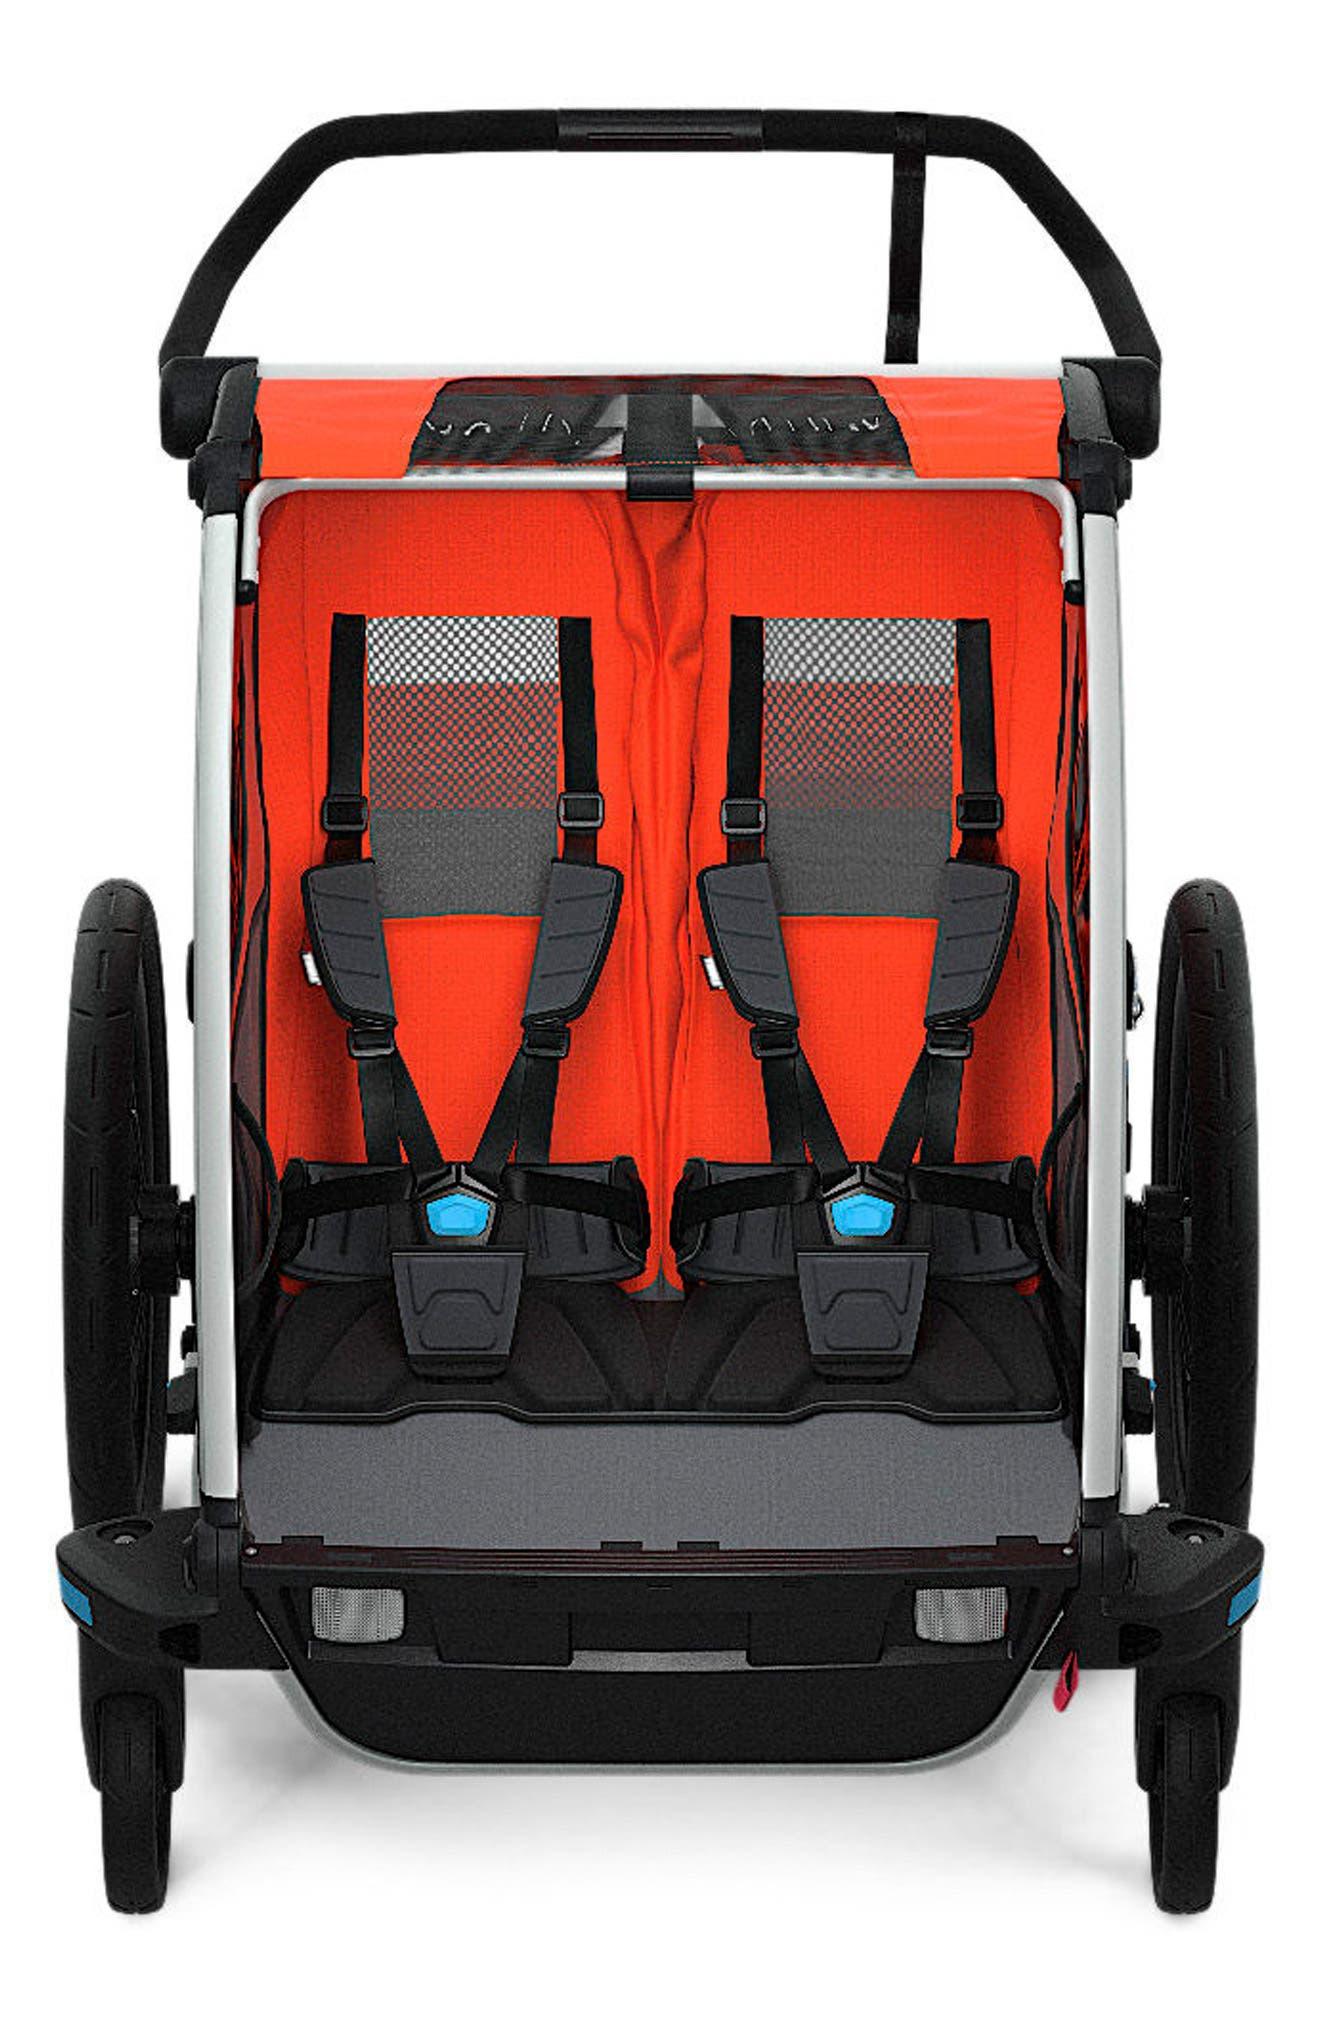 Chariot Cross 2 Multisport Double Cycle Trailer/Stroller,                             Main thumbnail 1, color,                             ROARANGE